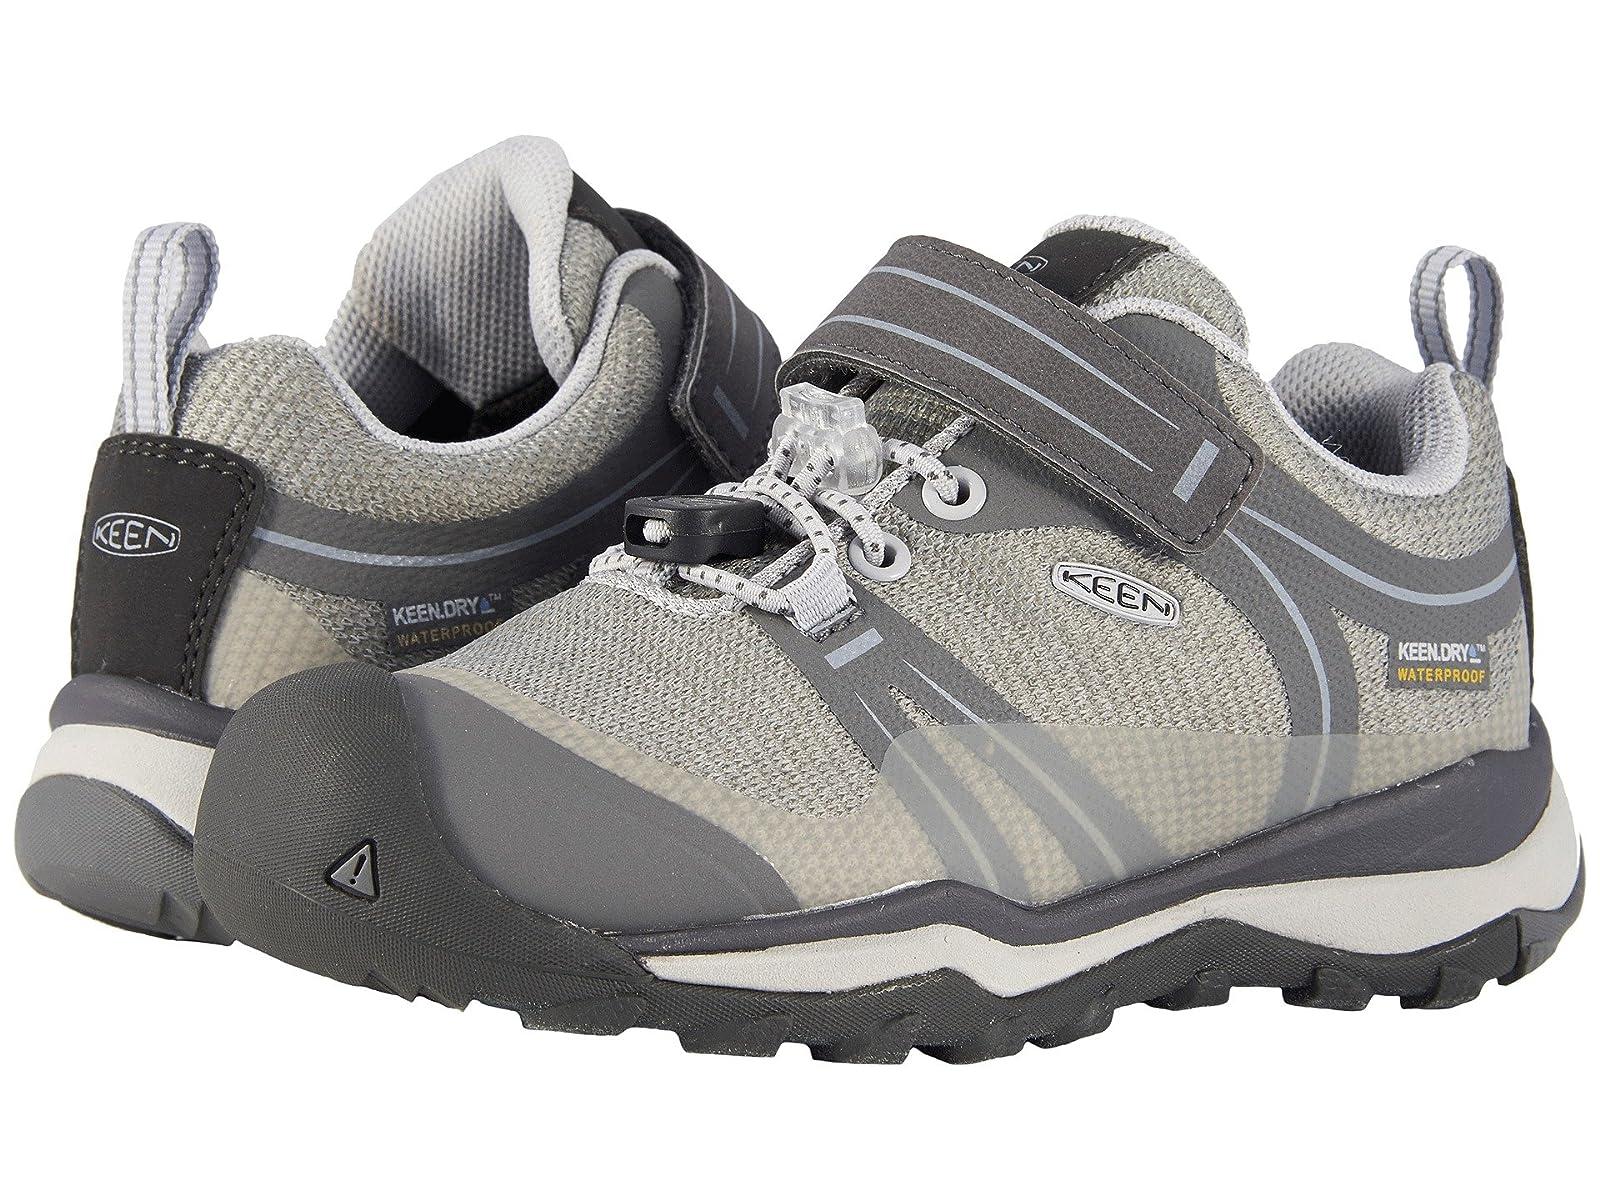 Keen Kids Terradora Low WP (Toddler/Little Kid)Atmospheric grades have affordable shoes